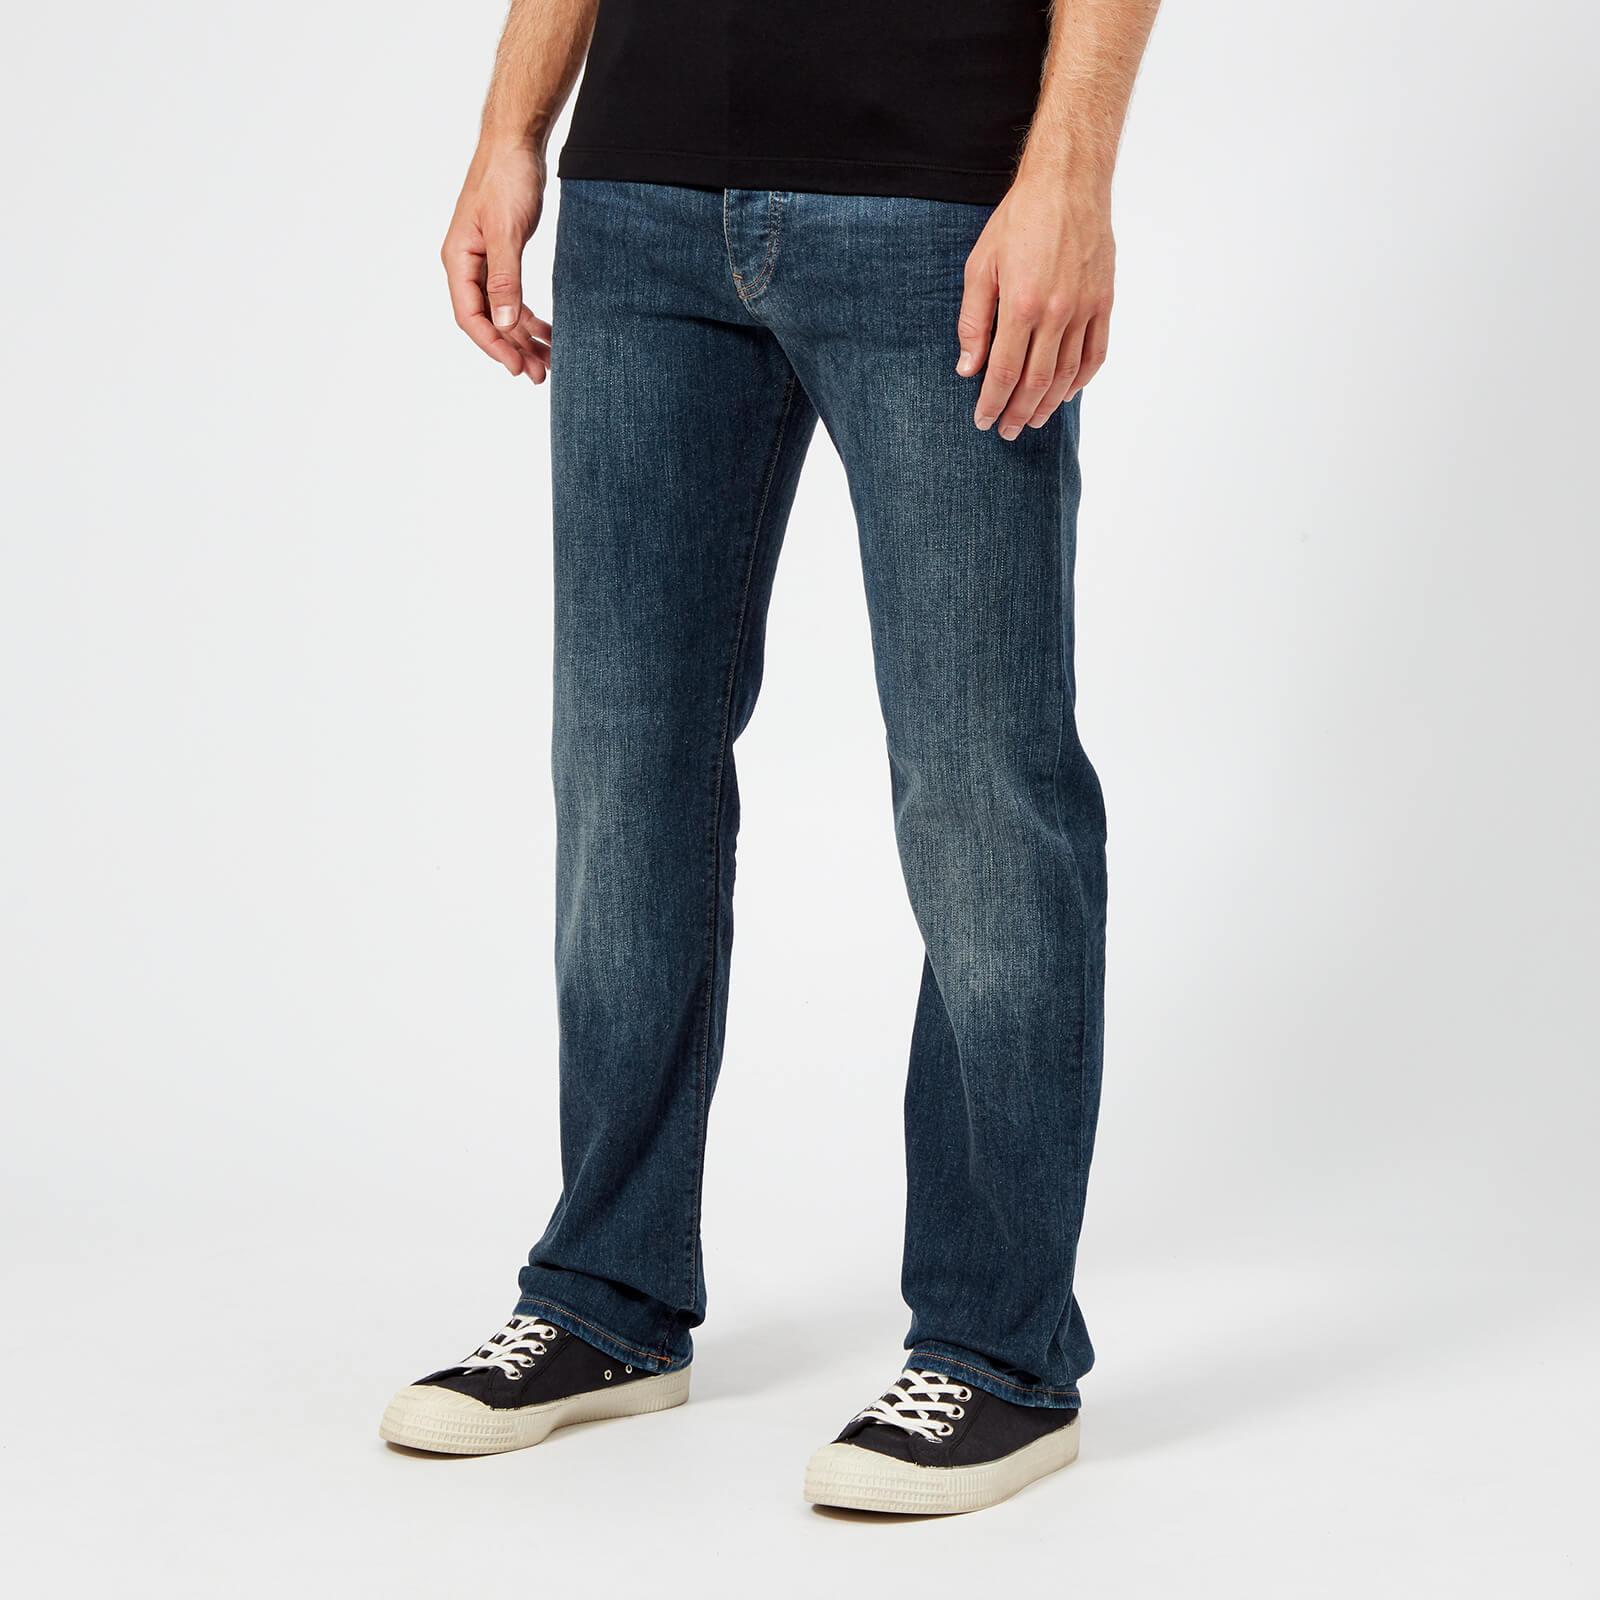 42bd54d41 Emporio Armani Men's 5 Pocket Slim Denim Jeans - Blue